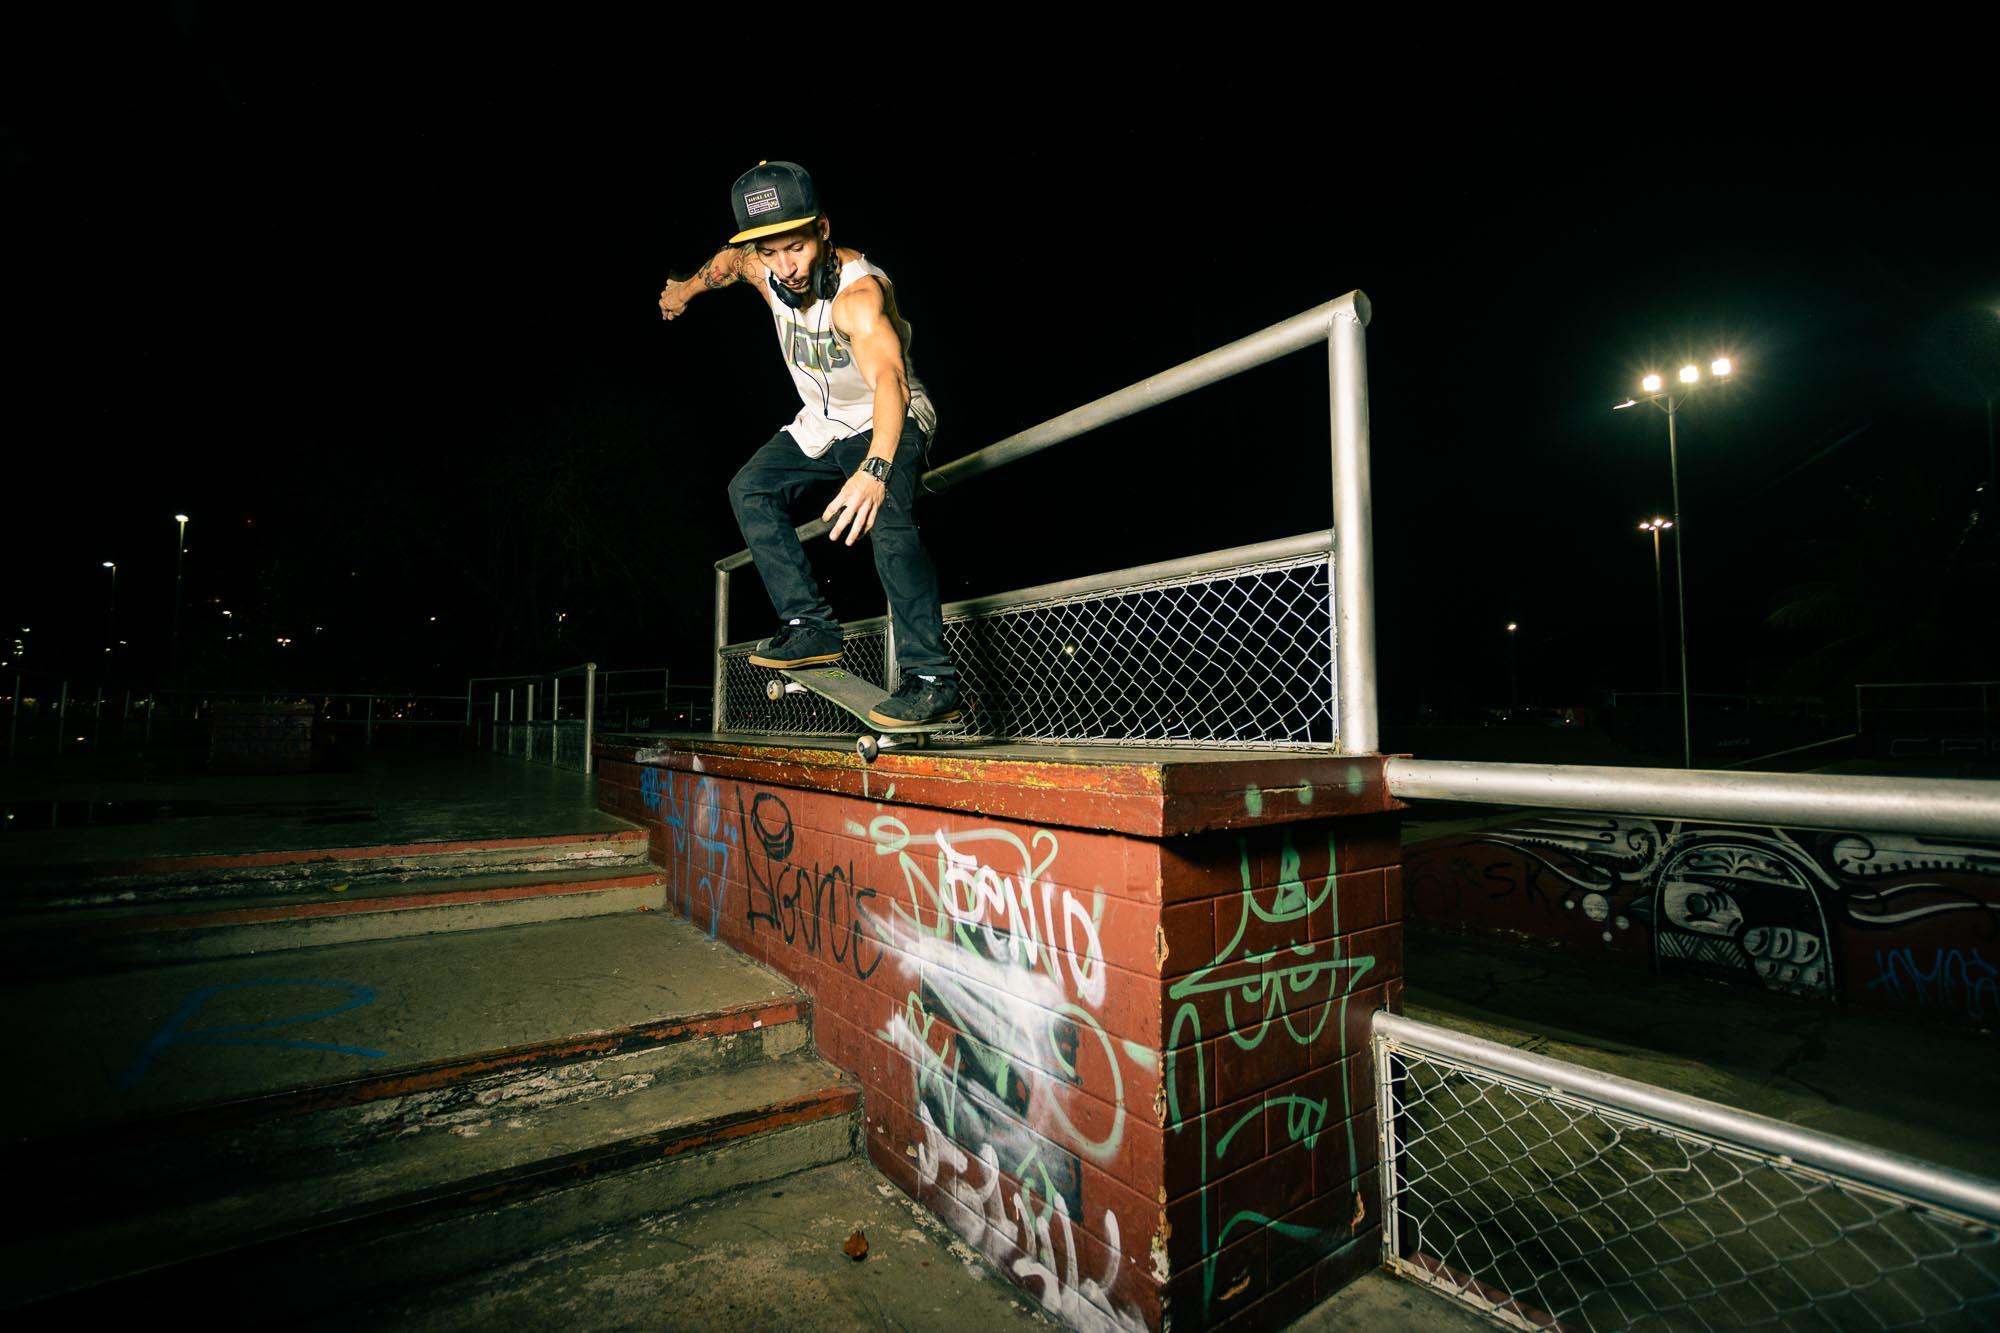 Greg Lee Skateboard Trick 1